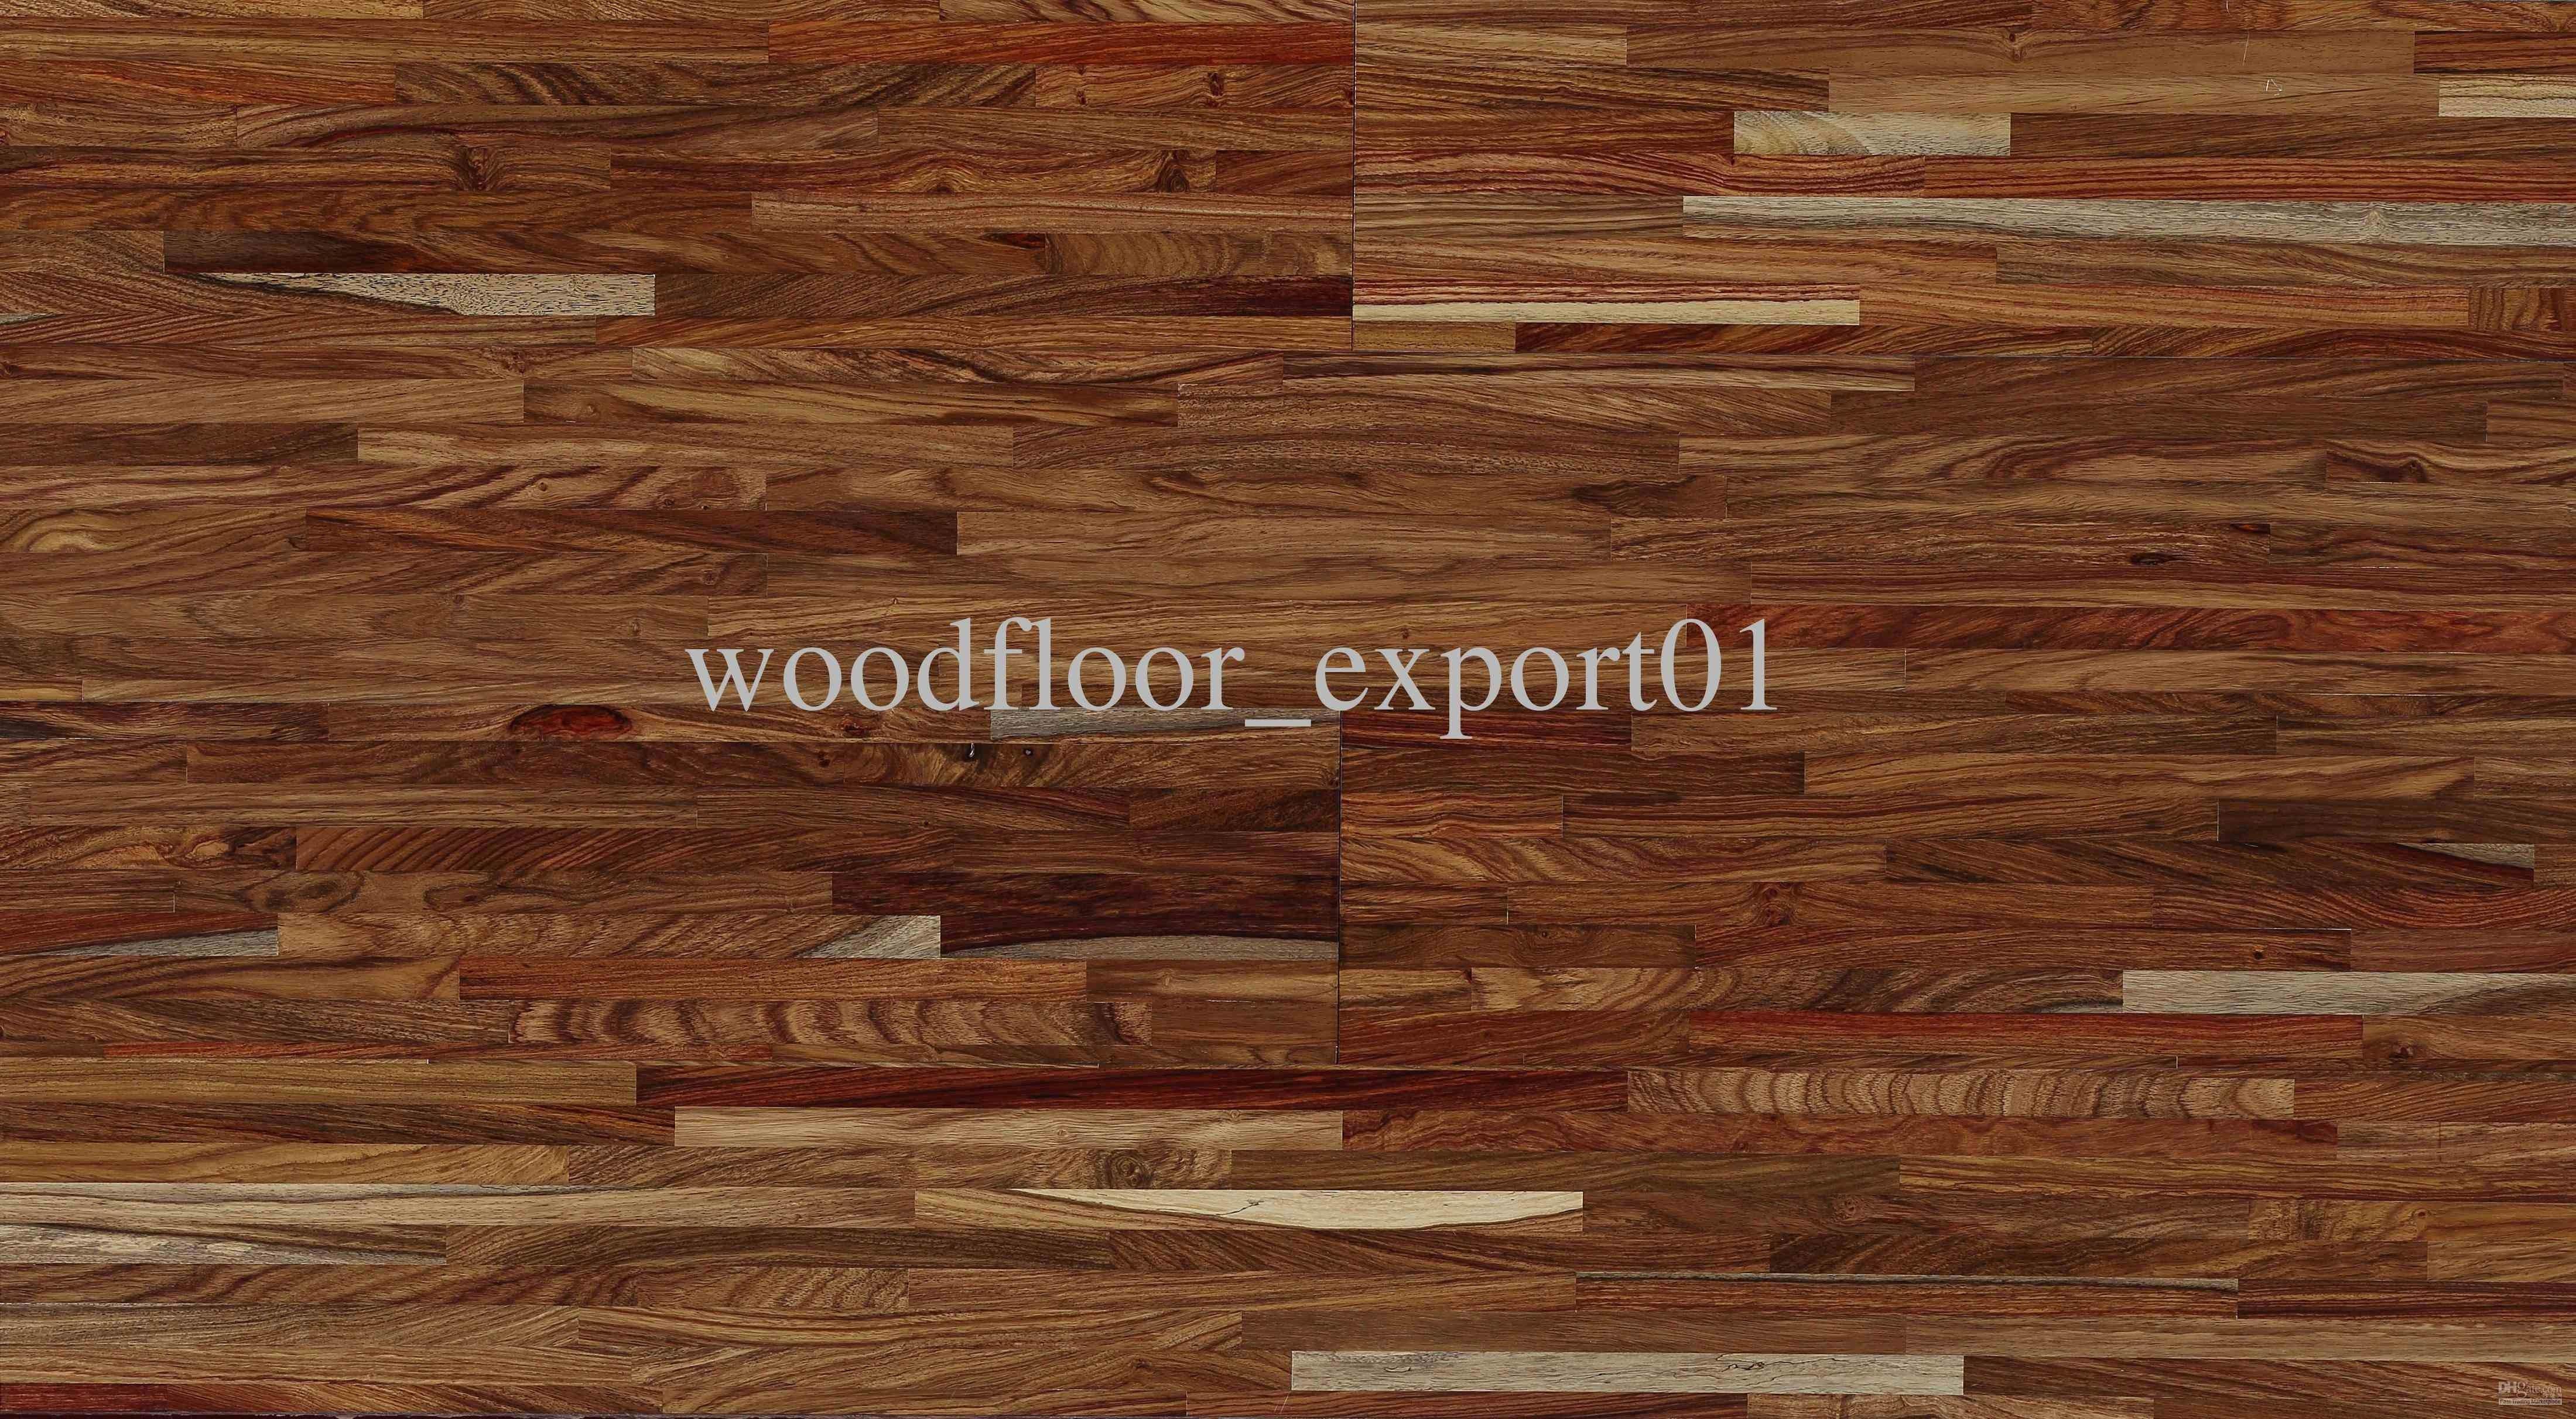 2 1 4 engineered hardwood flooring of 19 awesome pergo vs hardwood pics dizpos com for 50 lovely hardwood floor options 50 s